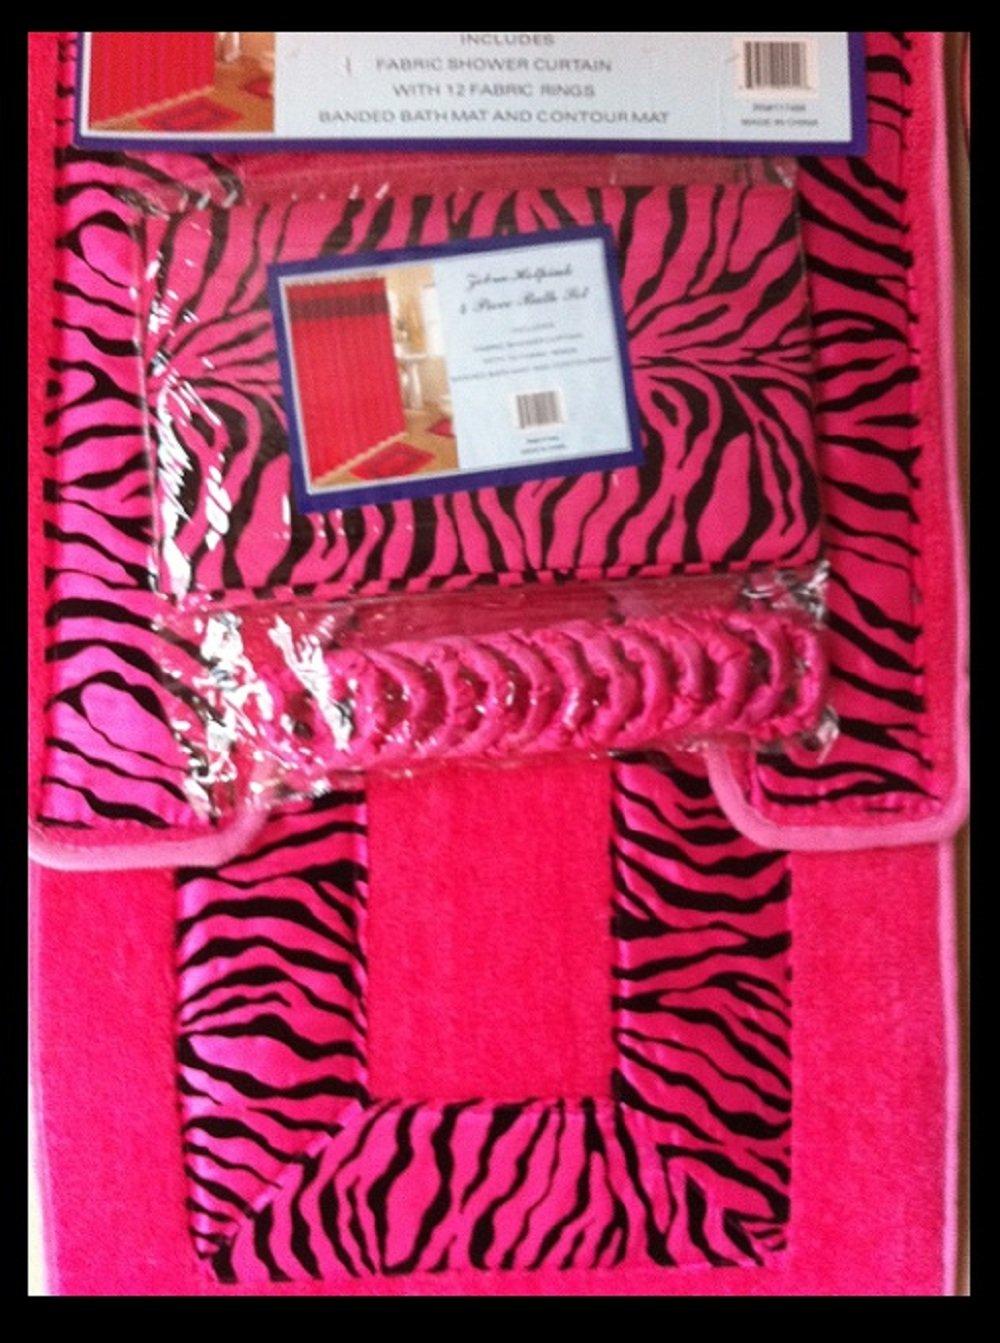 Amazoncom Piece Bath Rug Set Piece Pink Zebra Bathroom Rugs - Zebra bath mat for bathroom decorating ideas